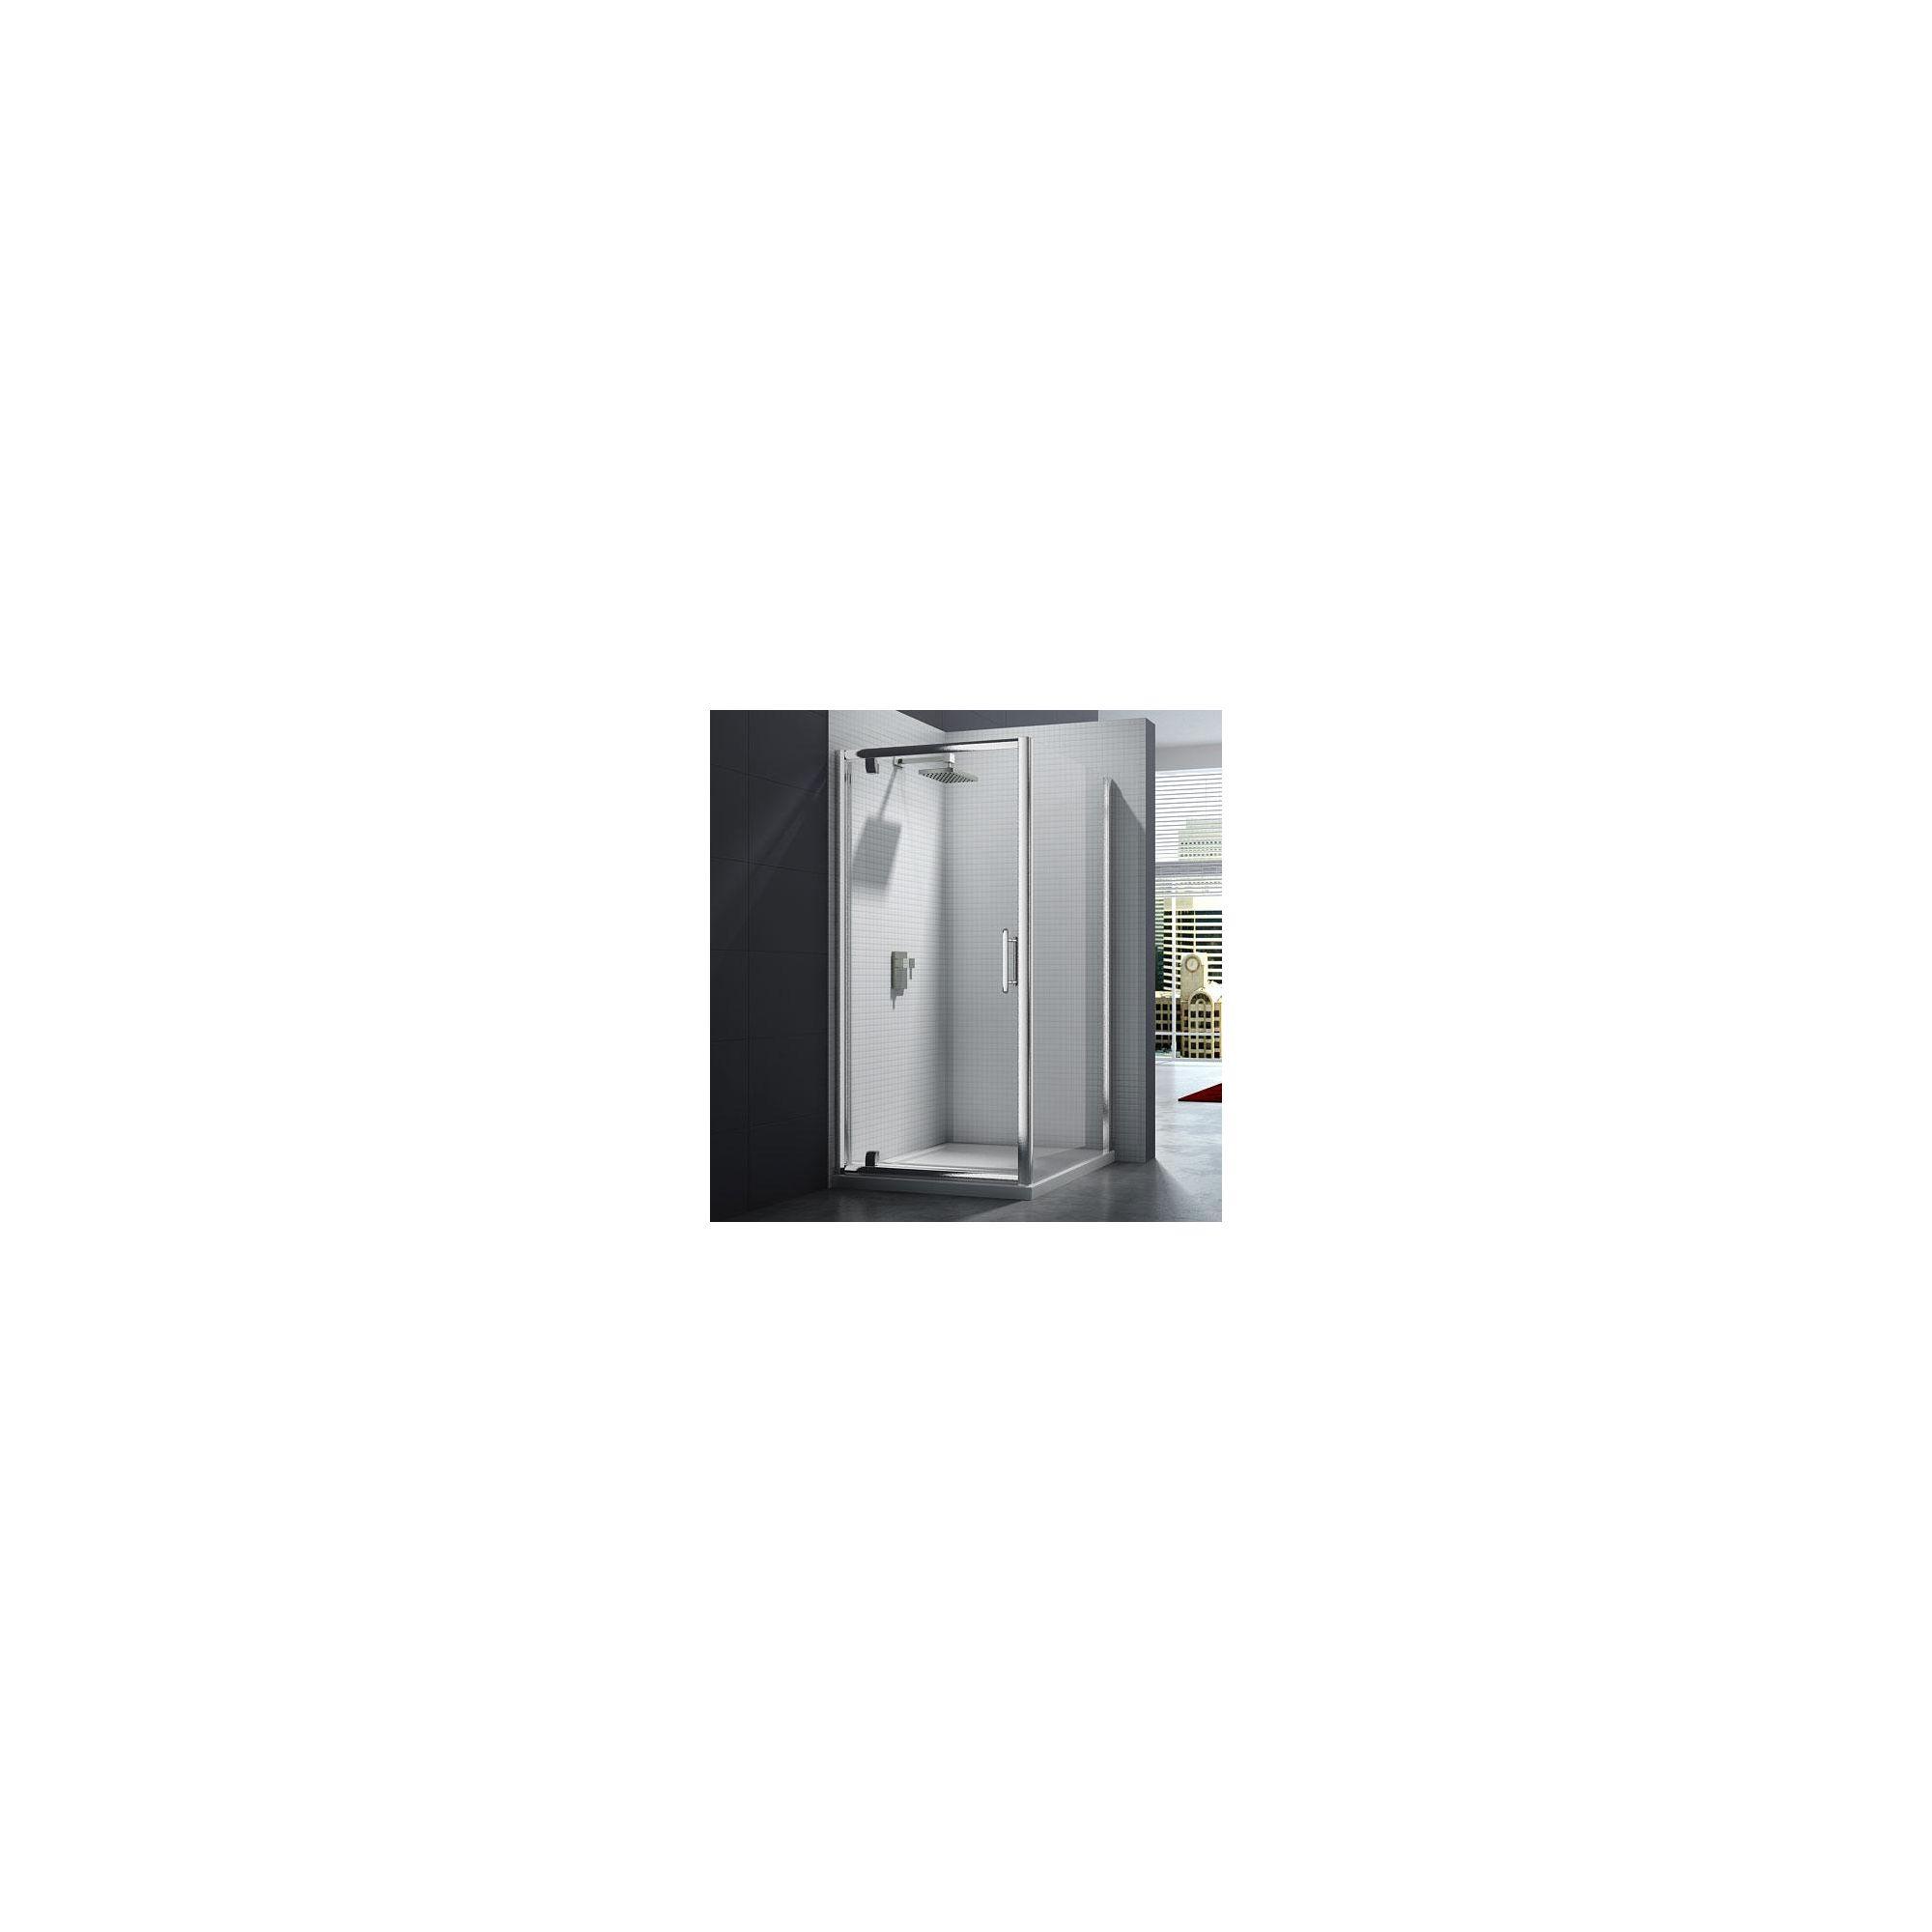 Merlyn Series 6 Pivot Shower Door, 900mm Wide, Chrome Frame, 6mm Glass at Tesco Direct